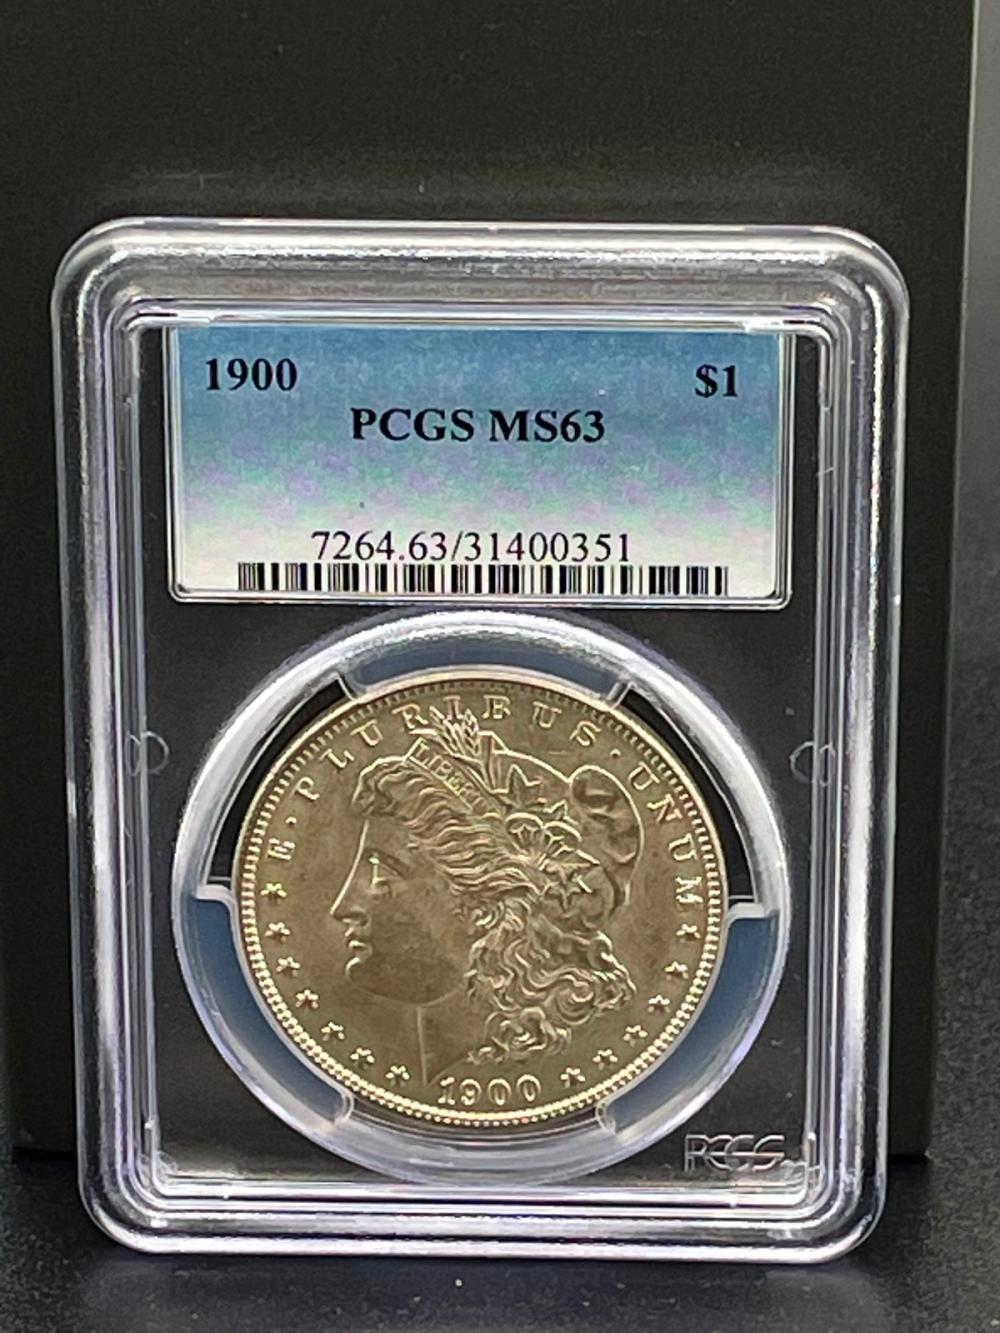 1900 Morgan Silver Dollar Graded PCGS MS63